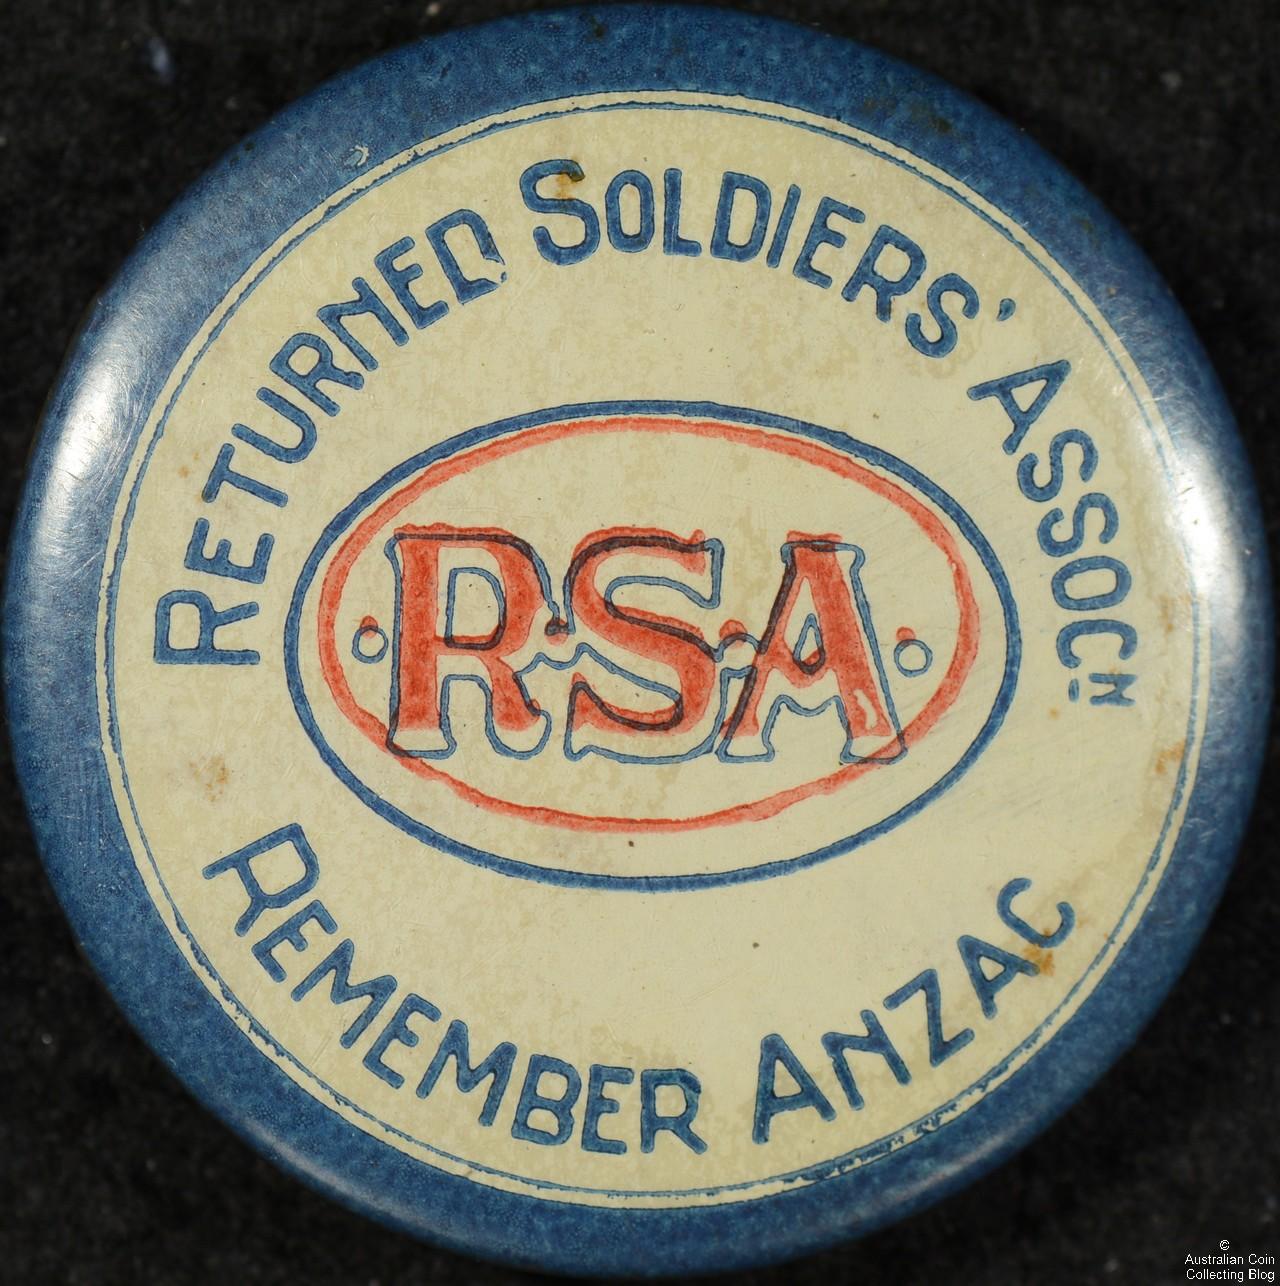 Returned Soldiers ASSOCn RSA Tin Badge